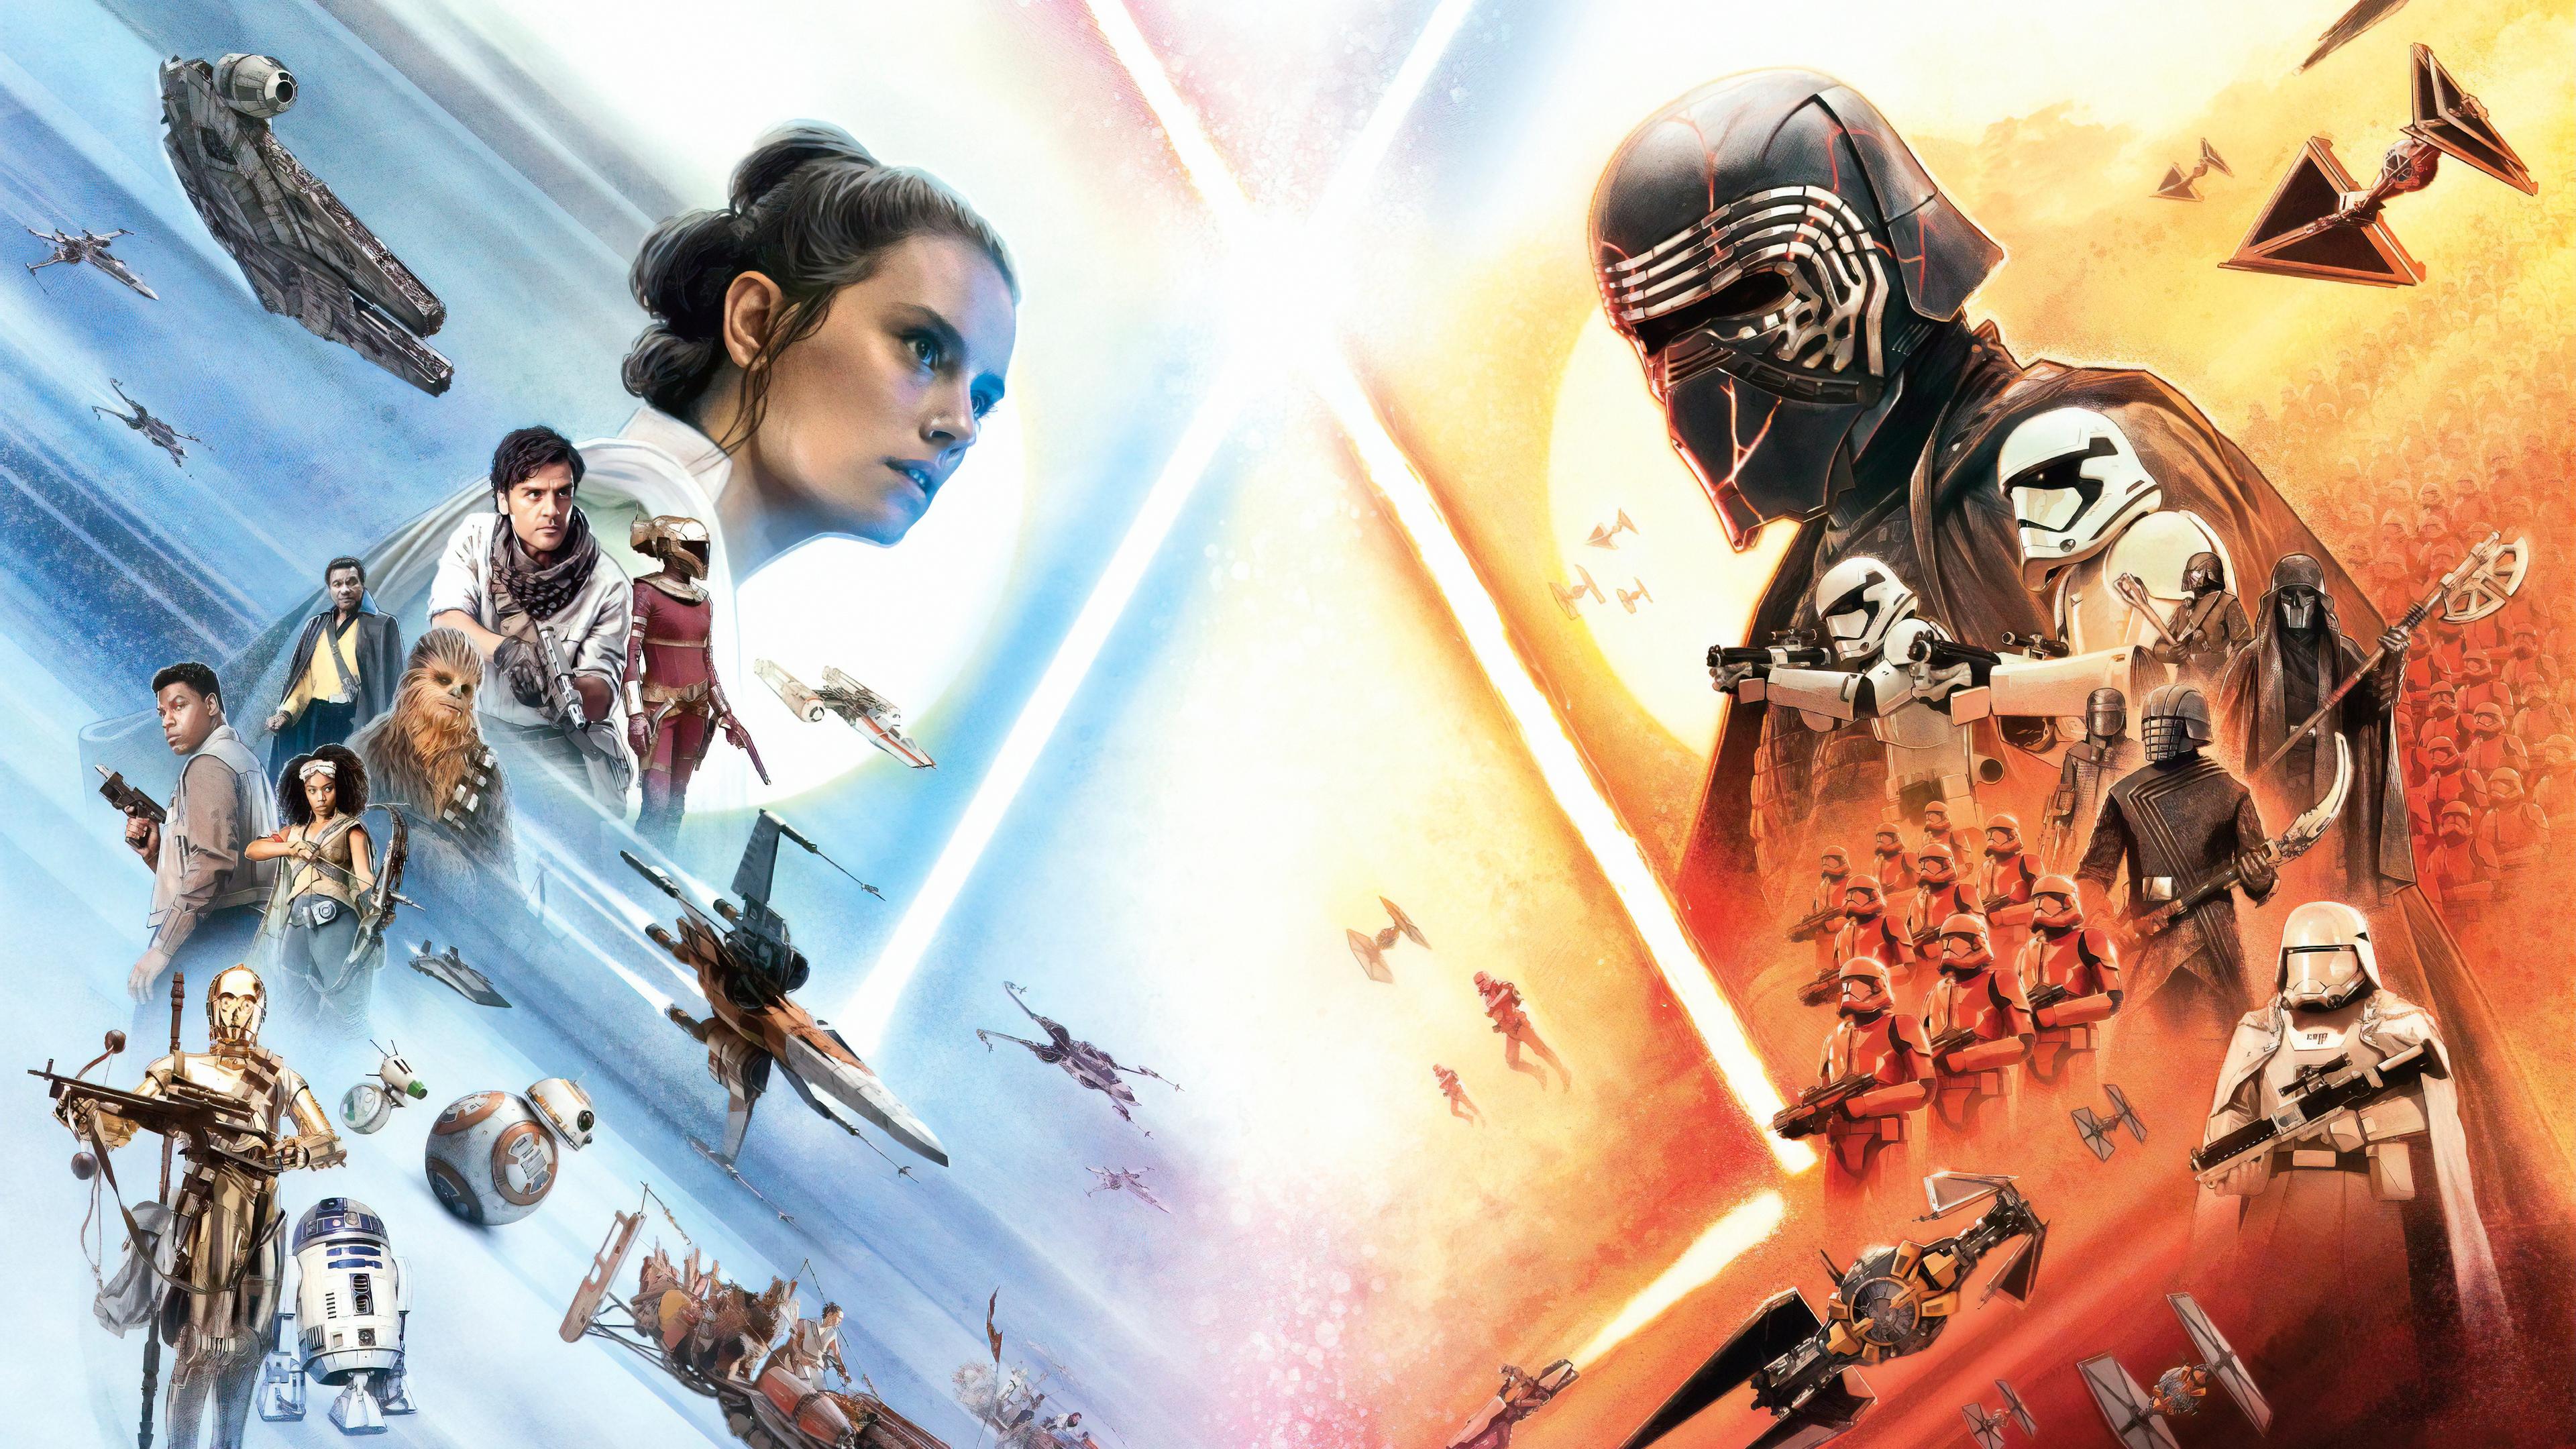 C 3po Chewbacca Finn Star Wars Kylo Ren Lando Calrissian Poe Dameron Rey Star Wars Star Wars Star Wa 3840x2160